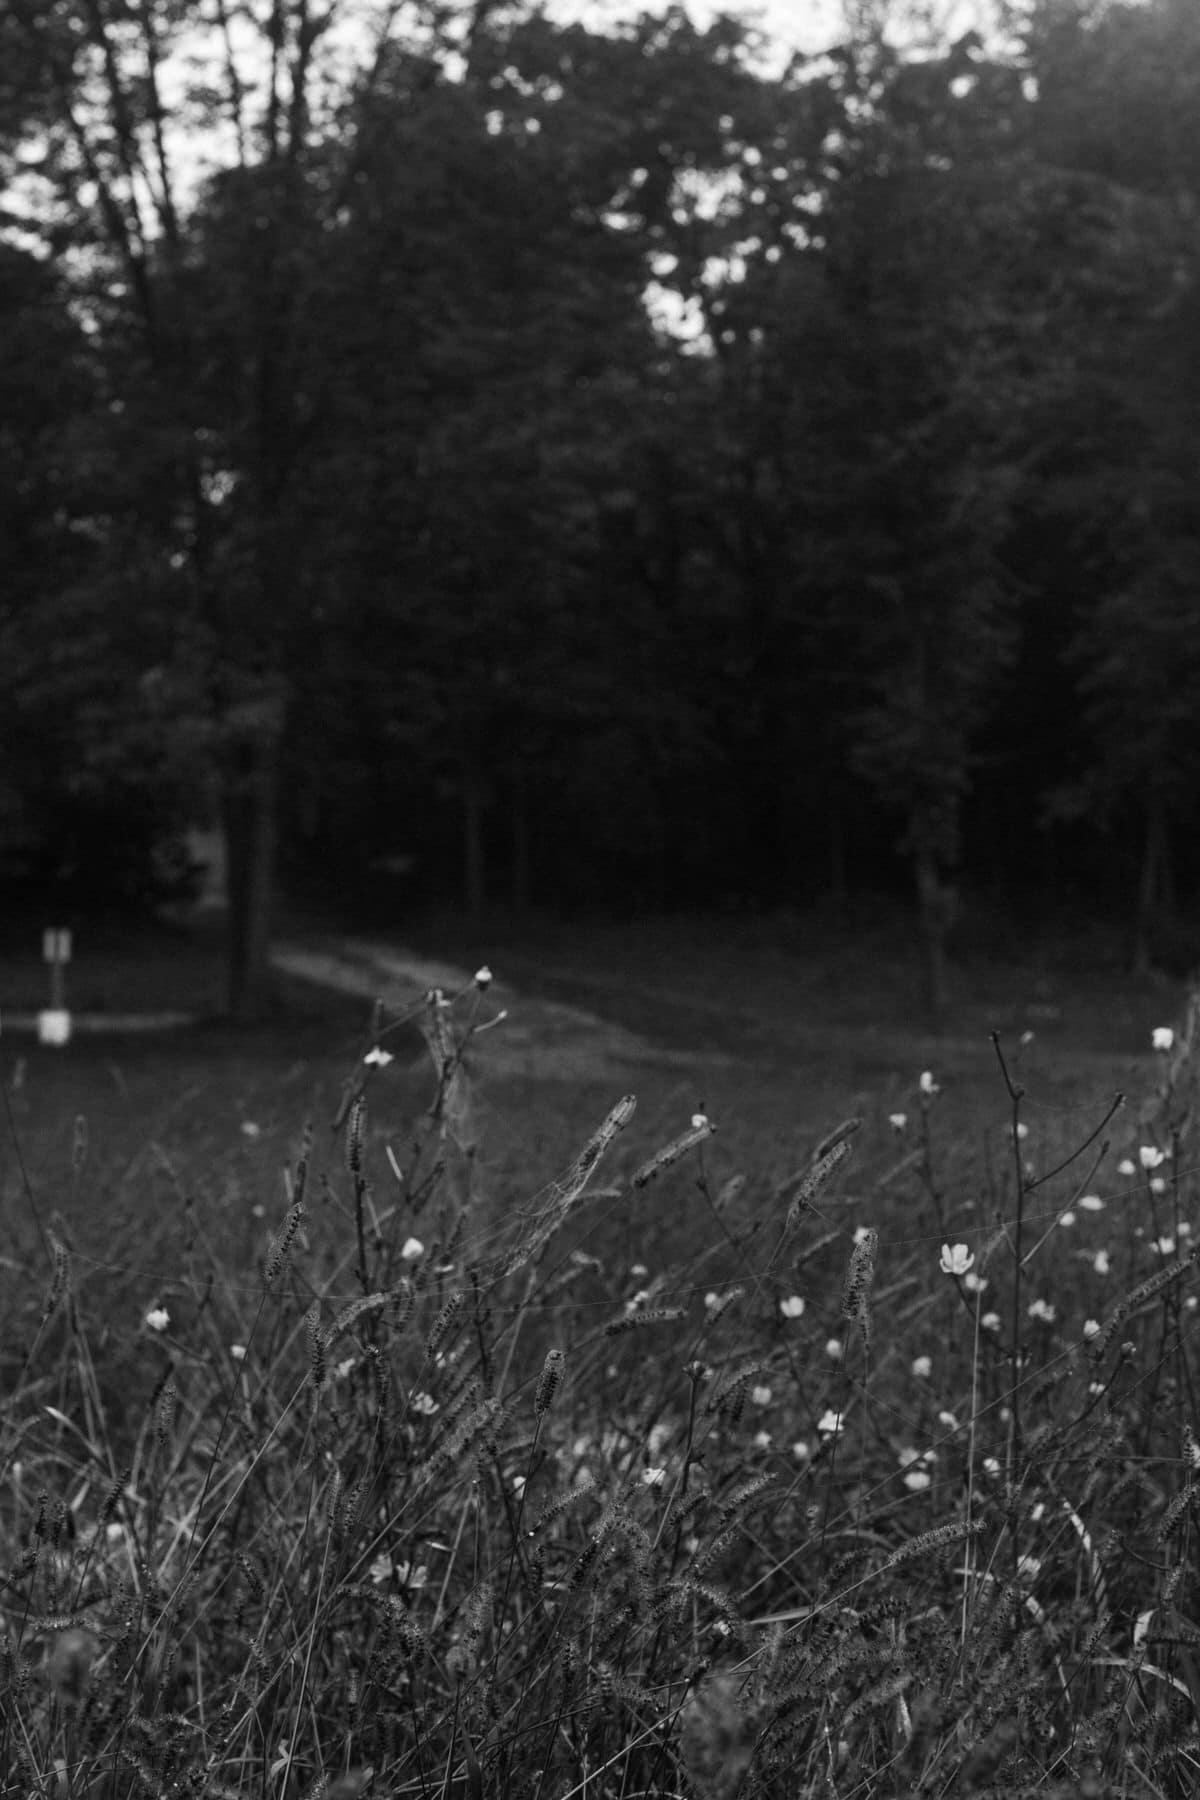 Kiekhaefer-Park-Fond-du-Lac-Wisconsin-black-and-white-fine-art-photography-by-Studio-L-photographer-Laura-Schneider-_3484